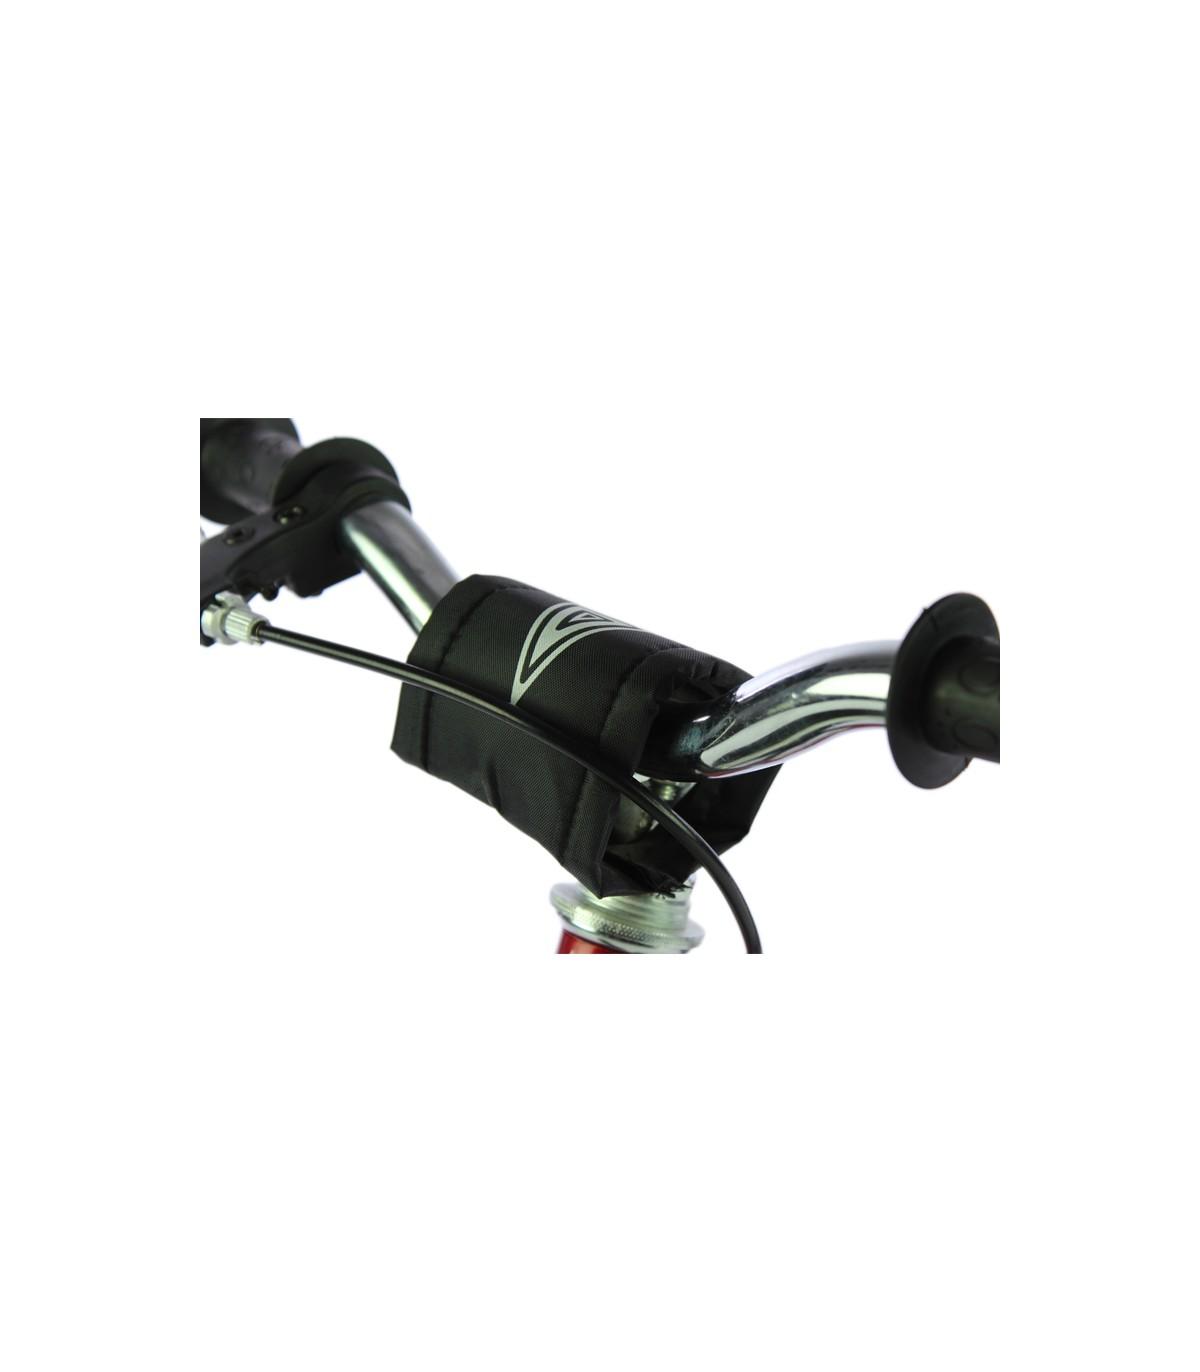 Grupo K-2 Wonduu Minibike Bicicleta Sin Pedales para Ni/ños Repetto